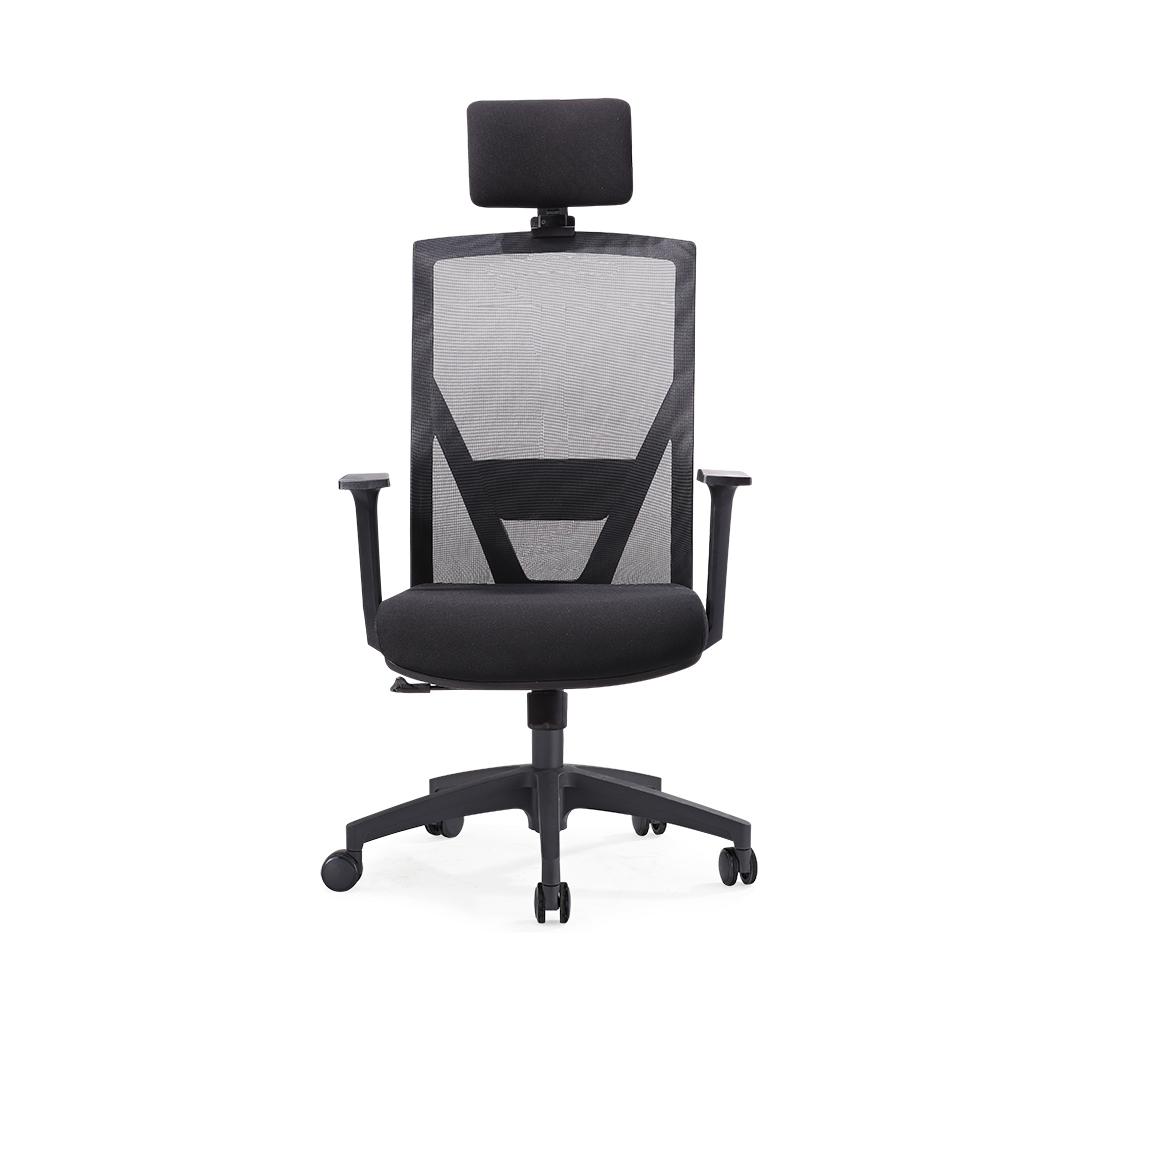 Verkäufe heißer neue beste mesh stuhl höhe verstellbare kopfstütze multifunktions armlehne smart büro stuhl